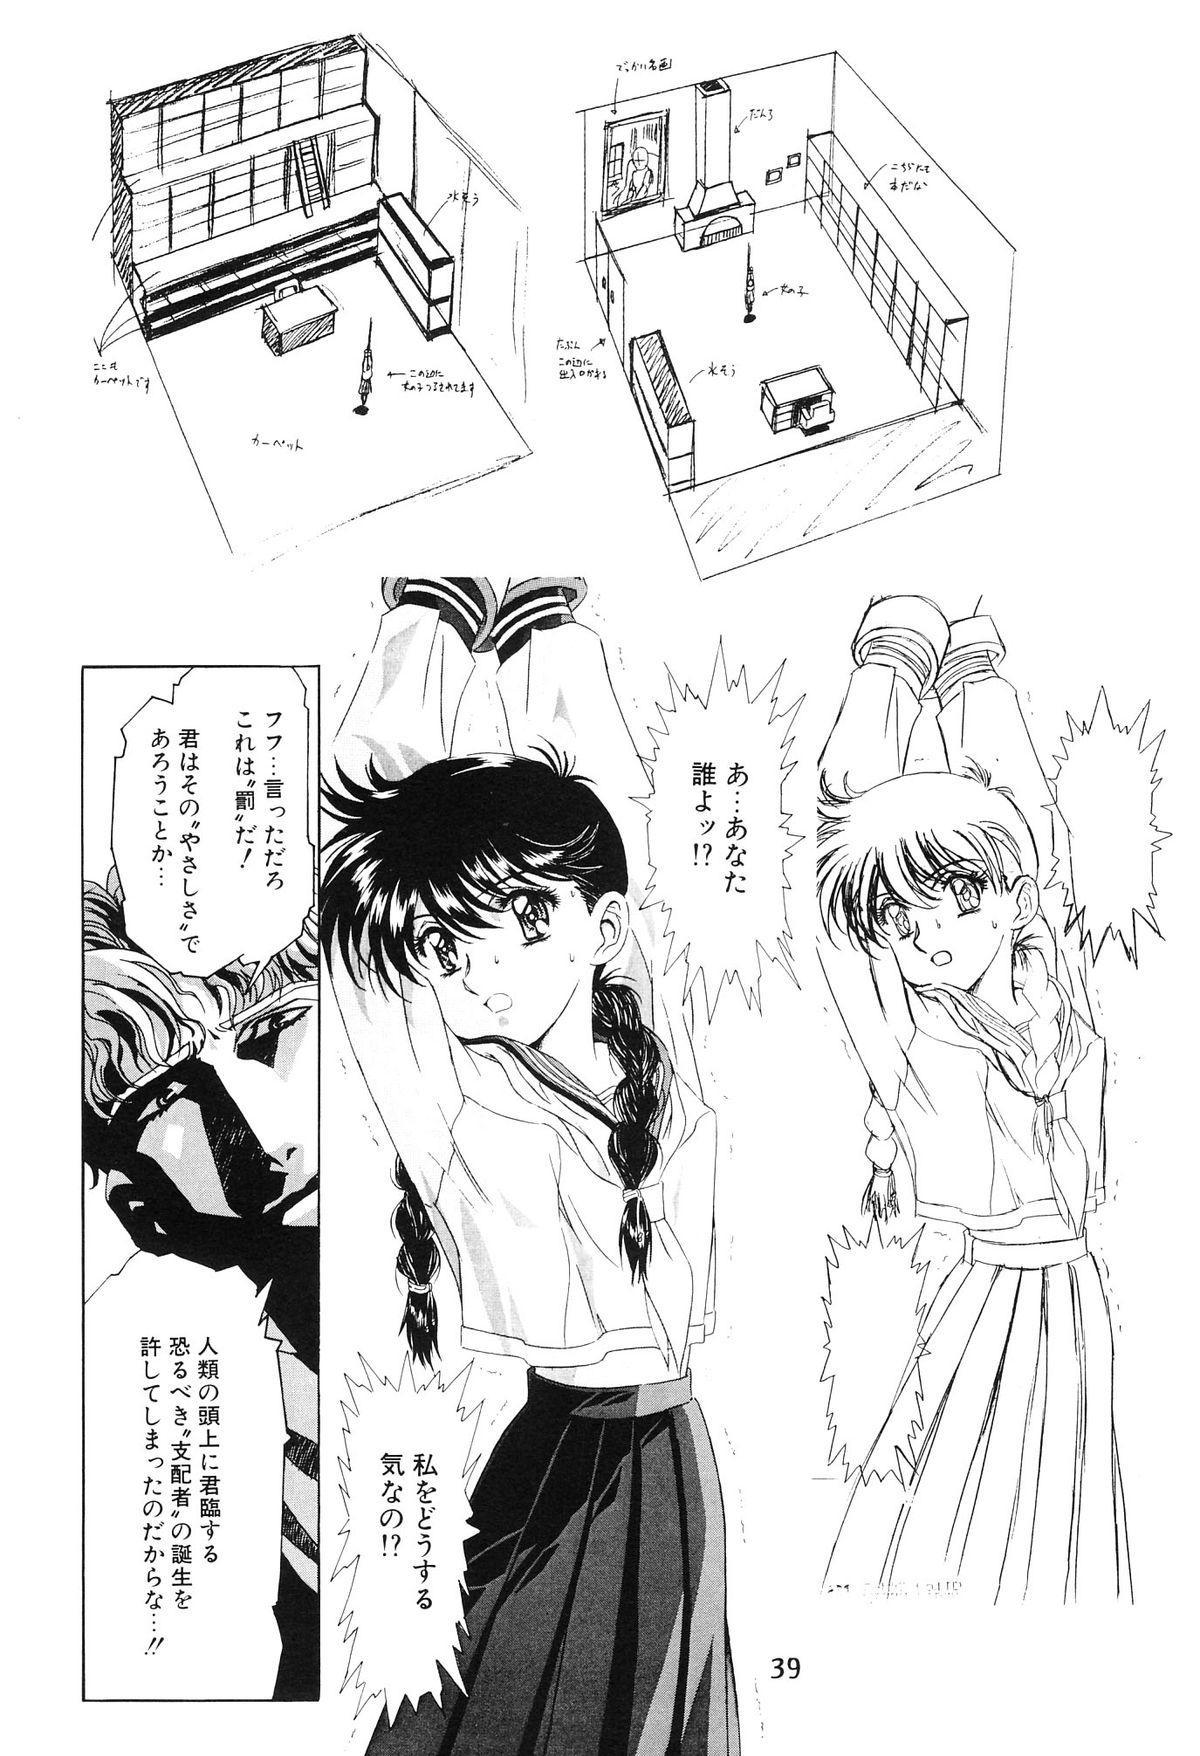 Henrei-kai '98 Natsu SPECIAL 40